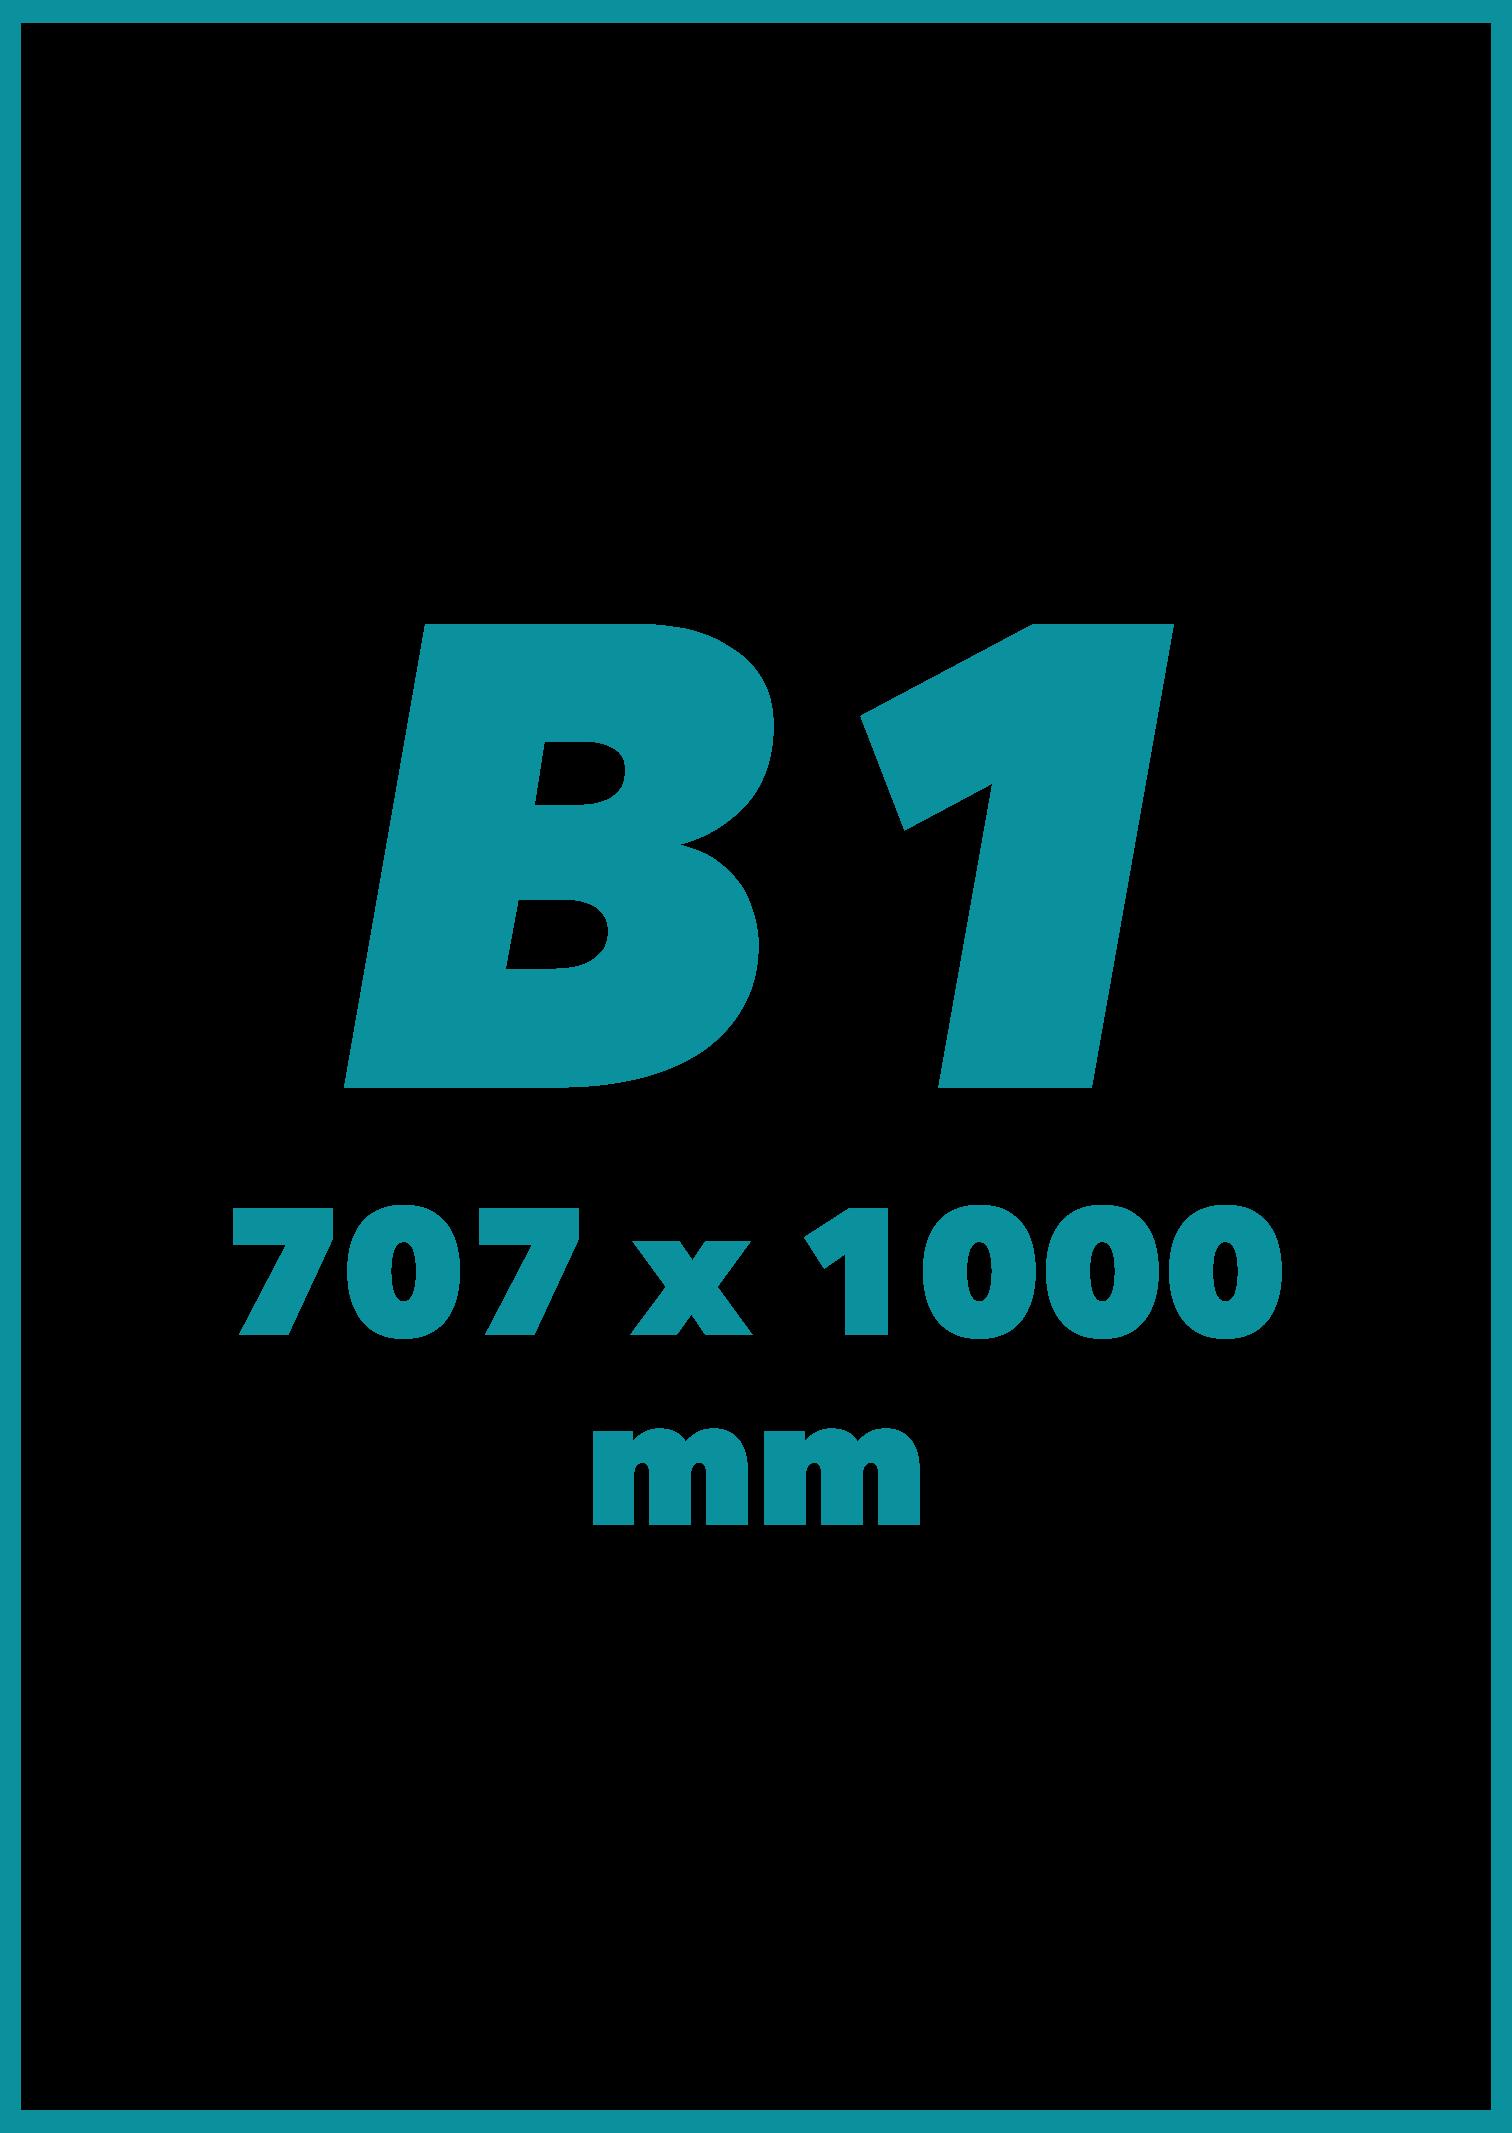 B1 Formatas